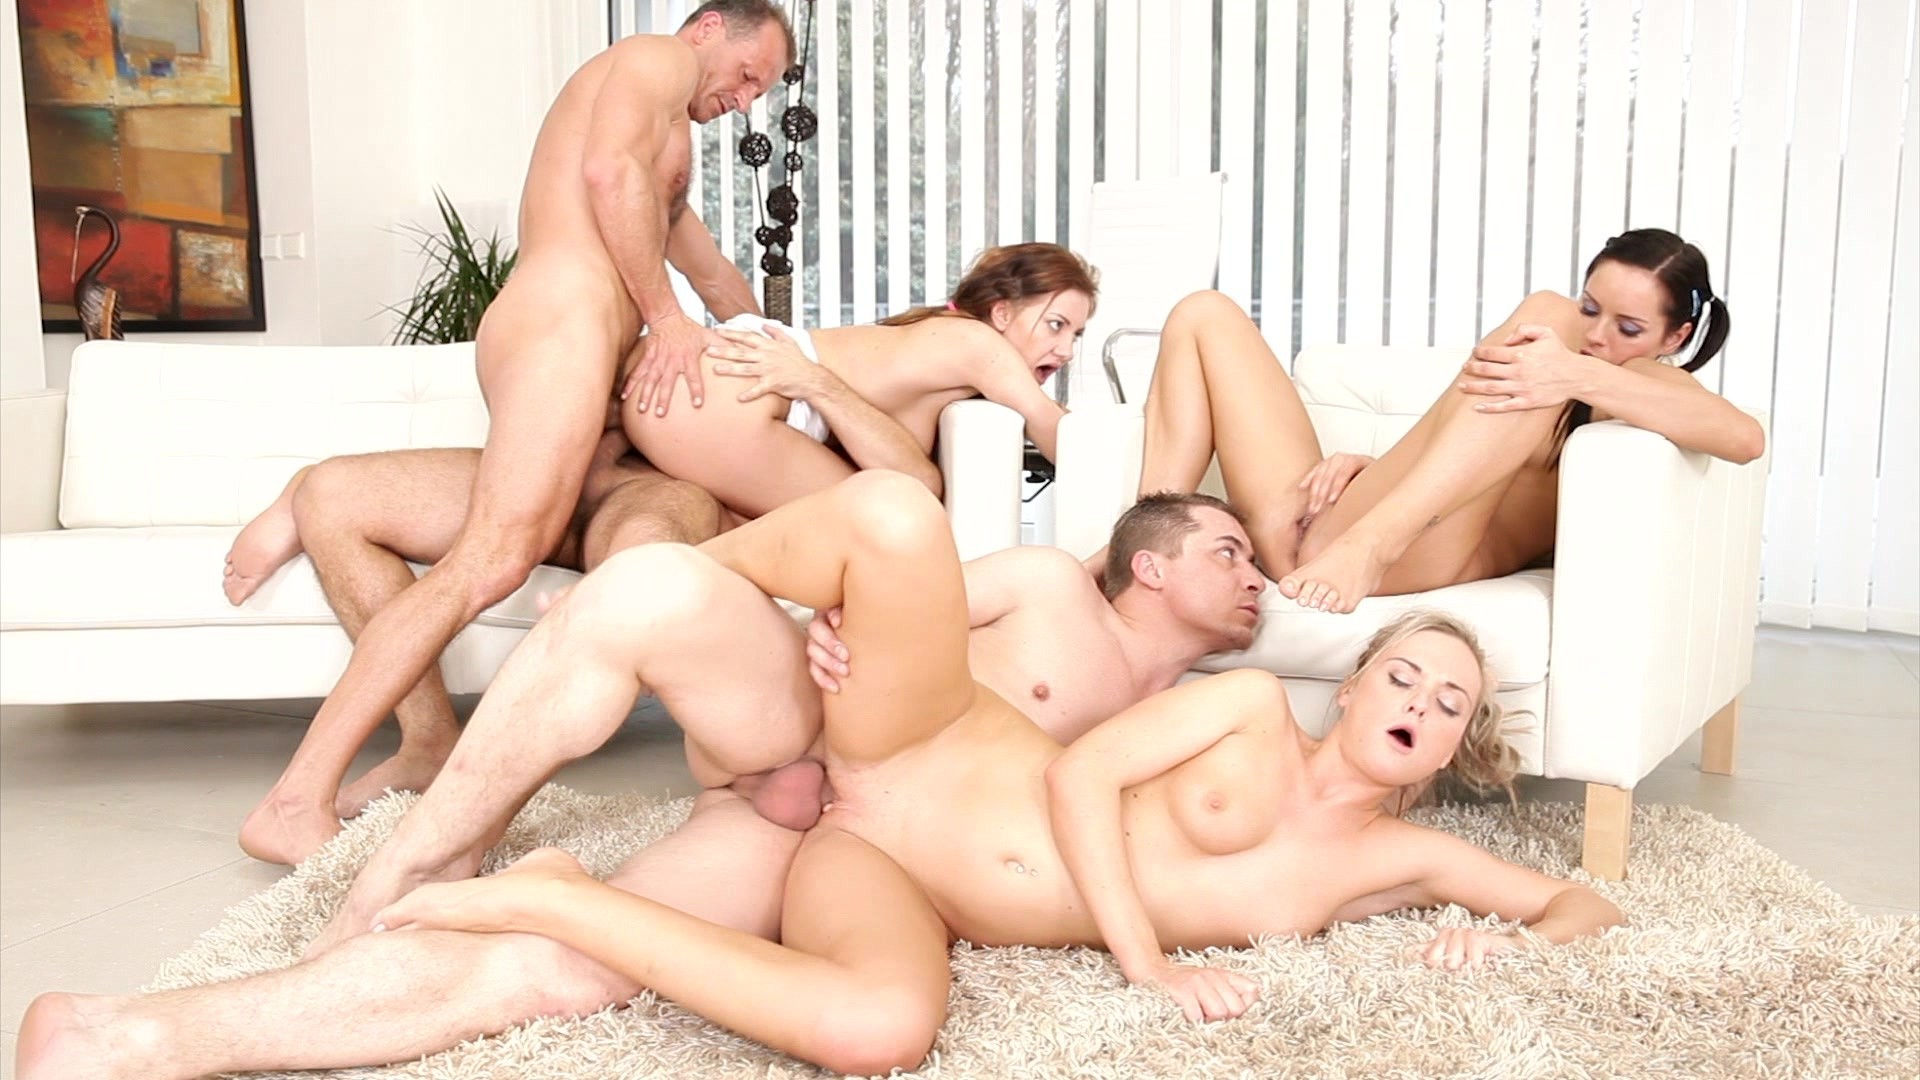 Foursome orgy swinger sex free, rqcecar girl nude